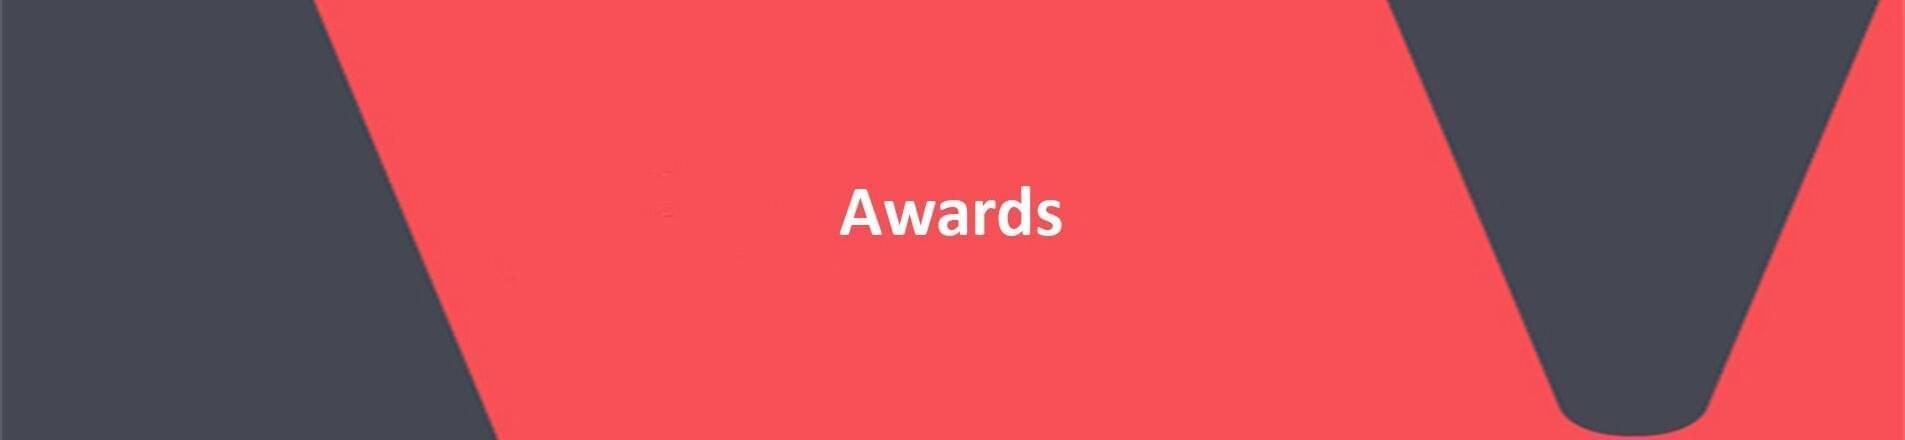 Awards on red VERCIDA background